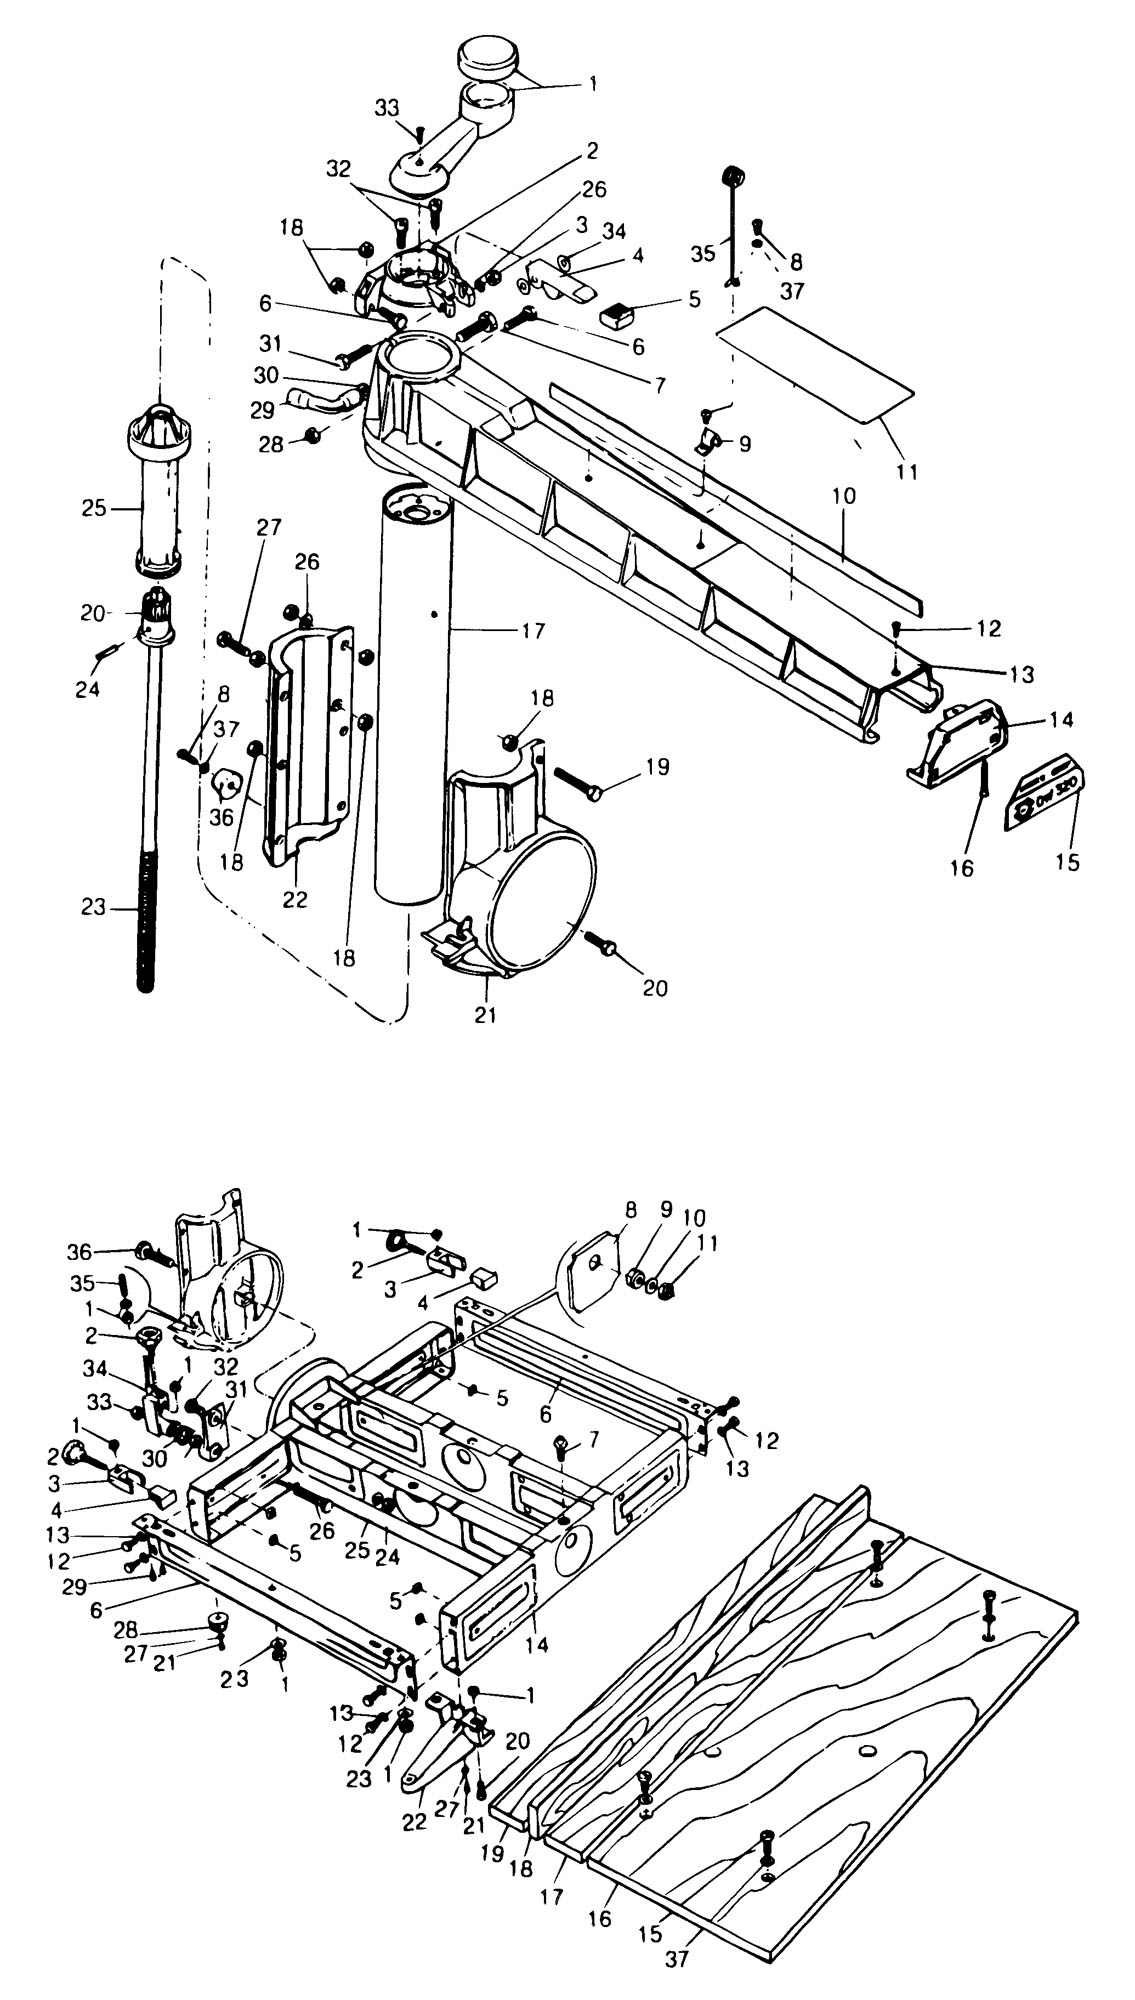 Spares for Dewalt Dw320-----a Radial Arm Saw (type 1